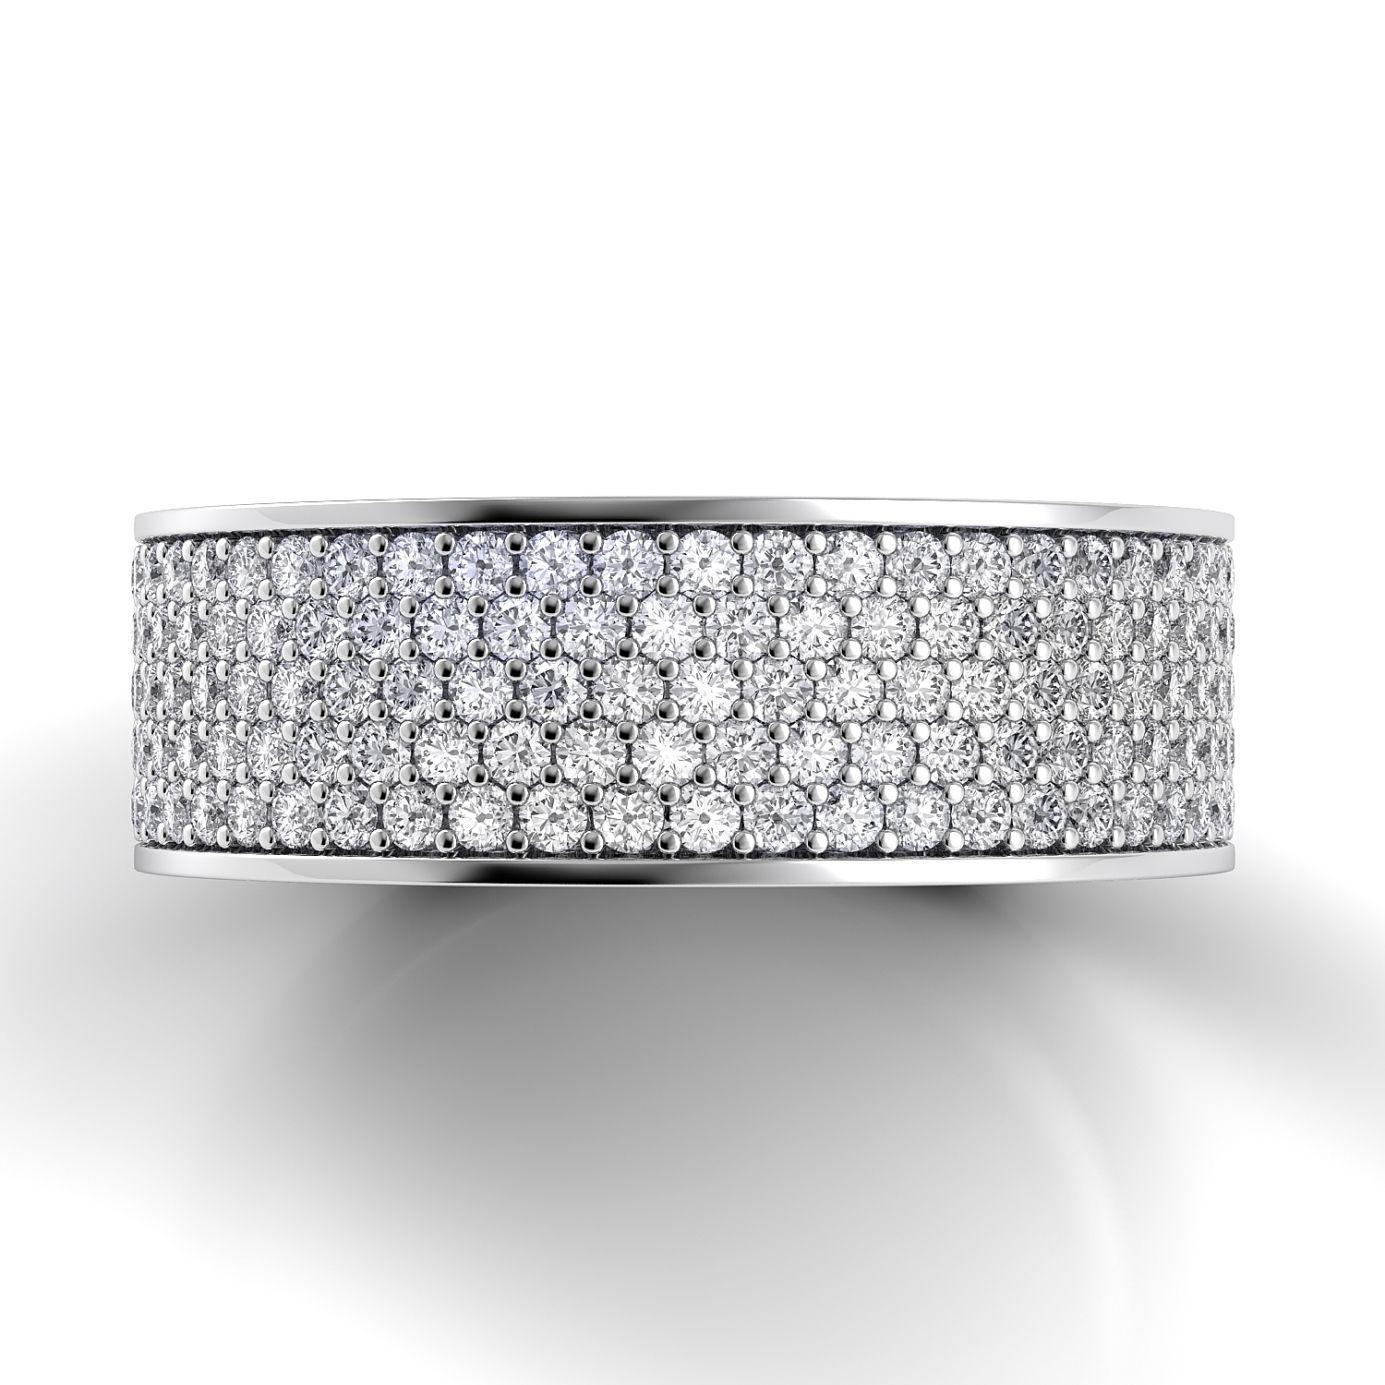 Danhov Classico Flat Diamond Band CB106-A: Engagement Rings   Wedding Bands   Custom Jewelry   Diamonds